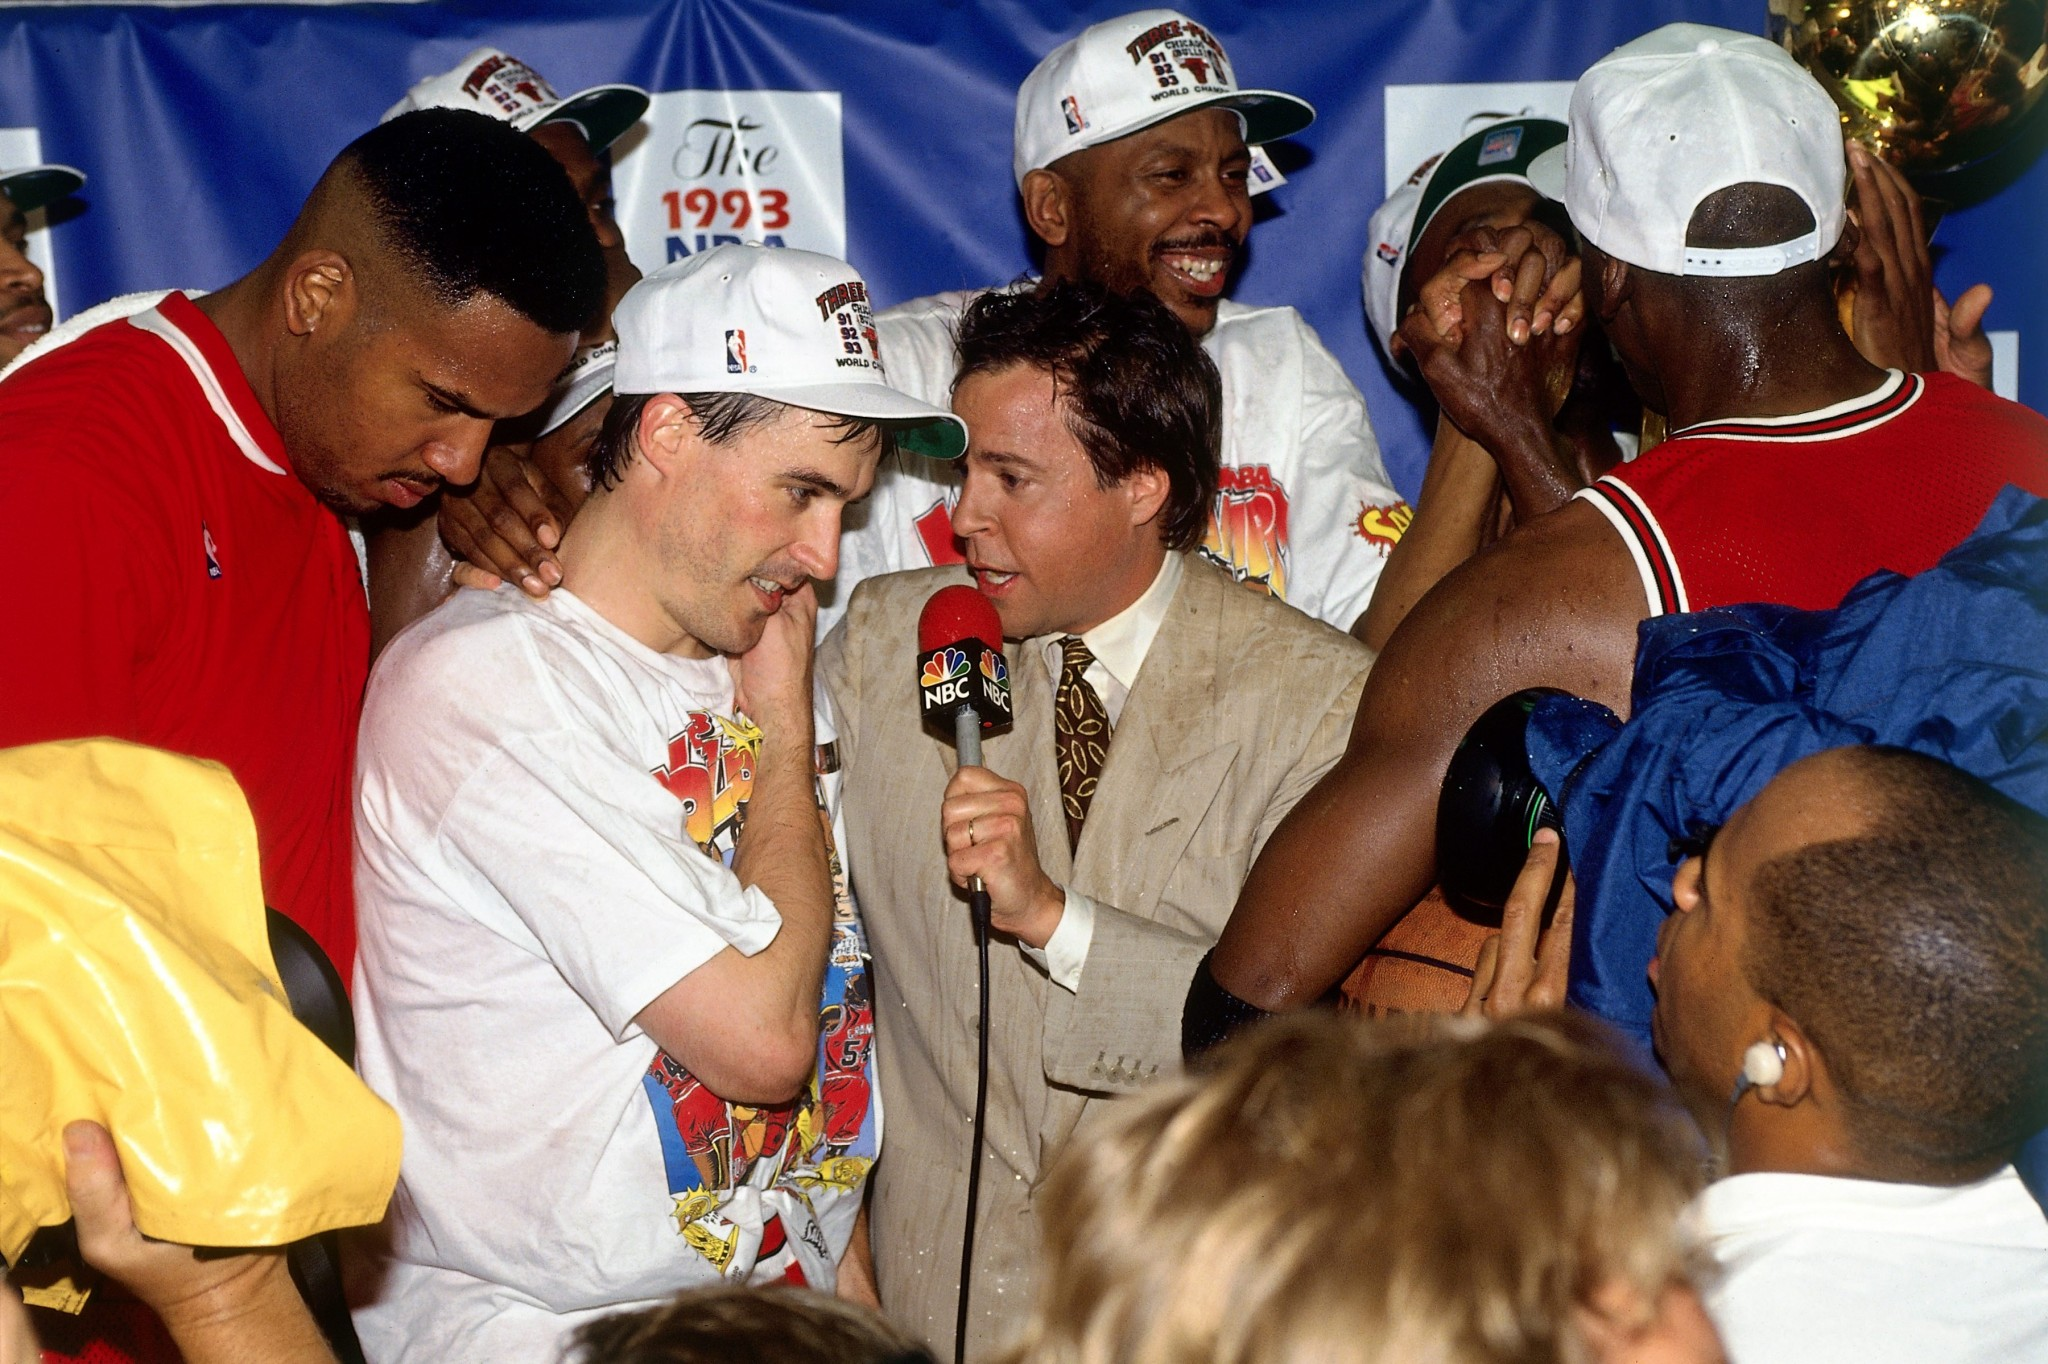 John Paxson interviewed by Bob Costas following the 1993 NBA Finals